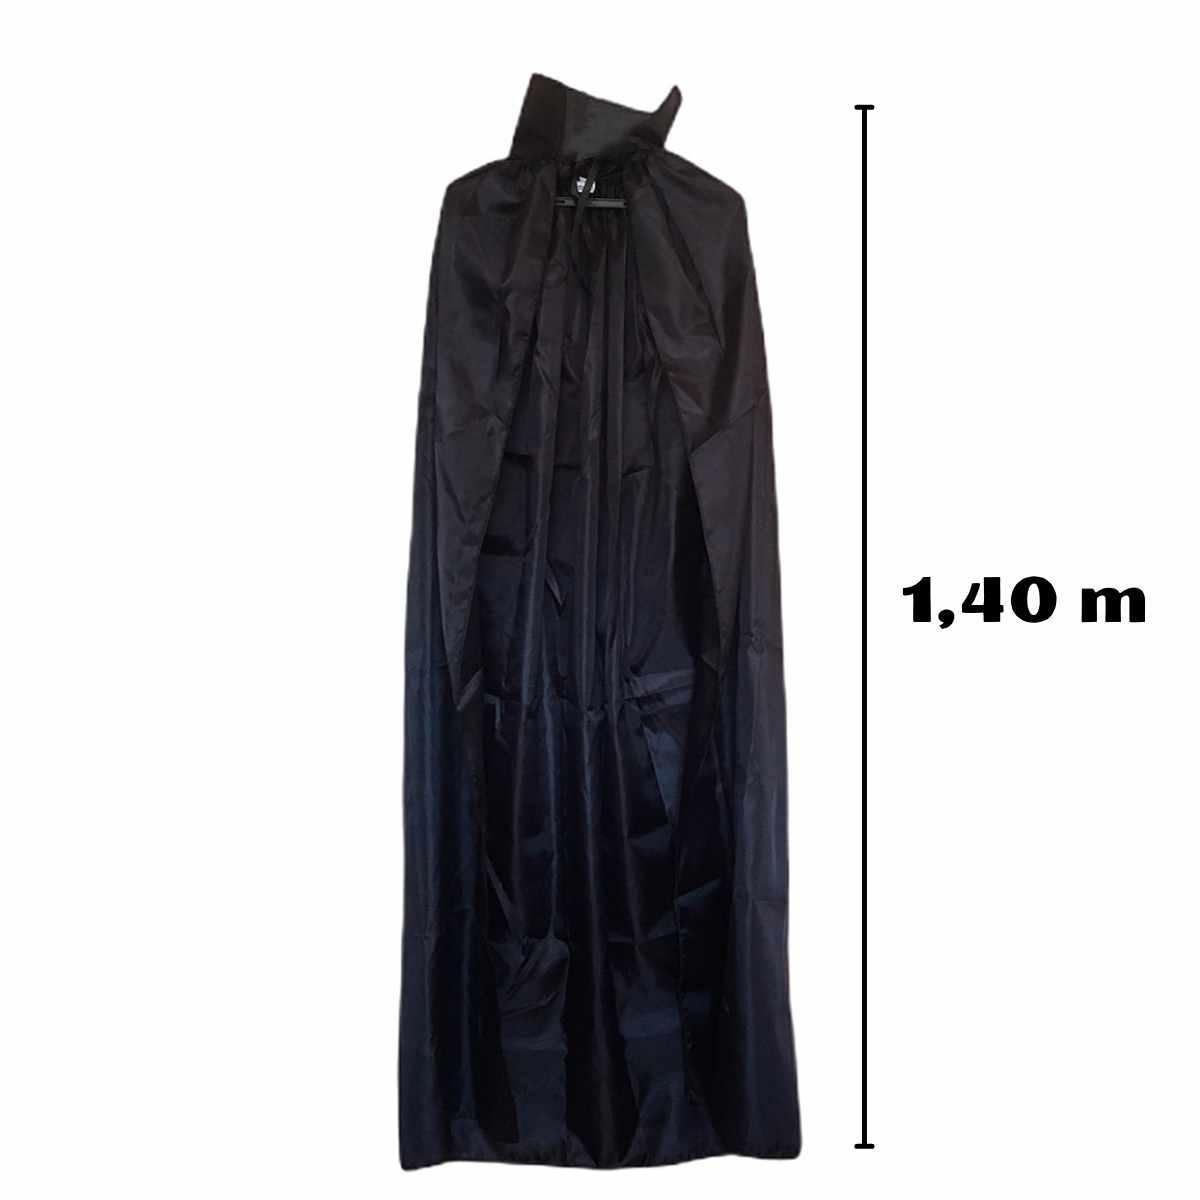 Capa Preta Adulto Poliéster 1,40m